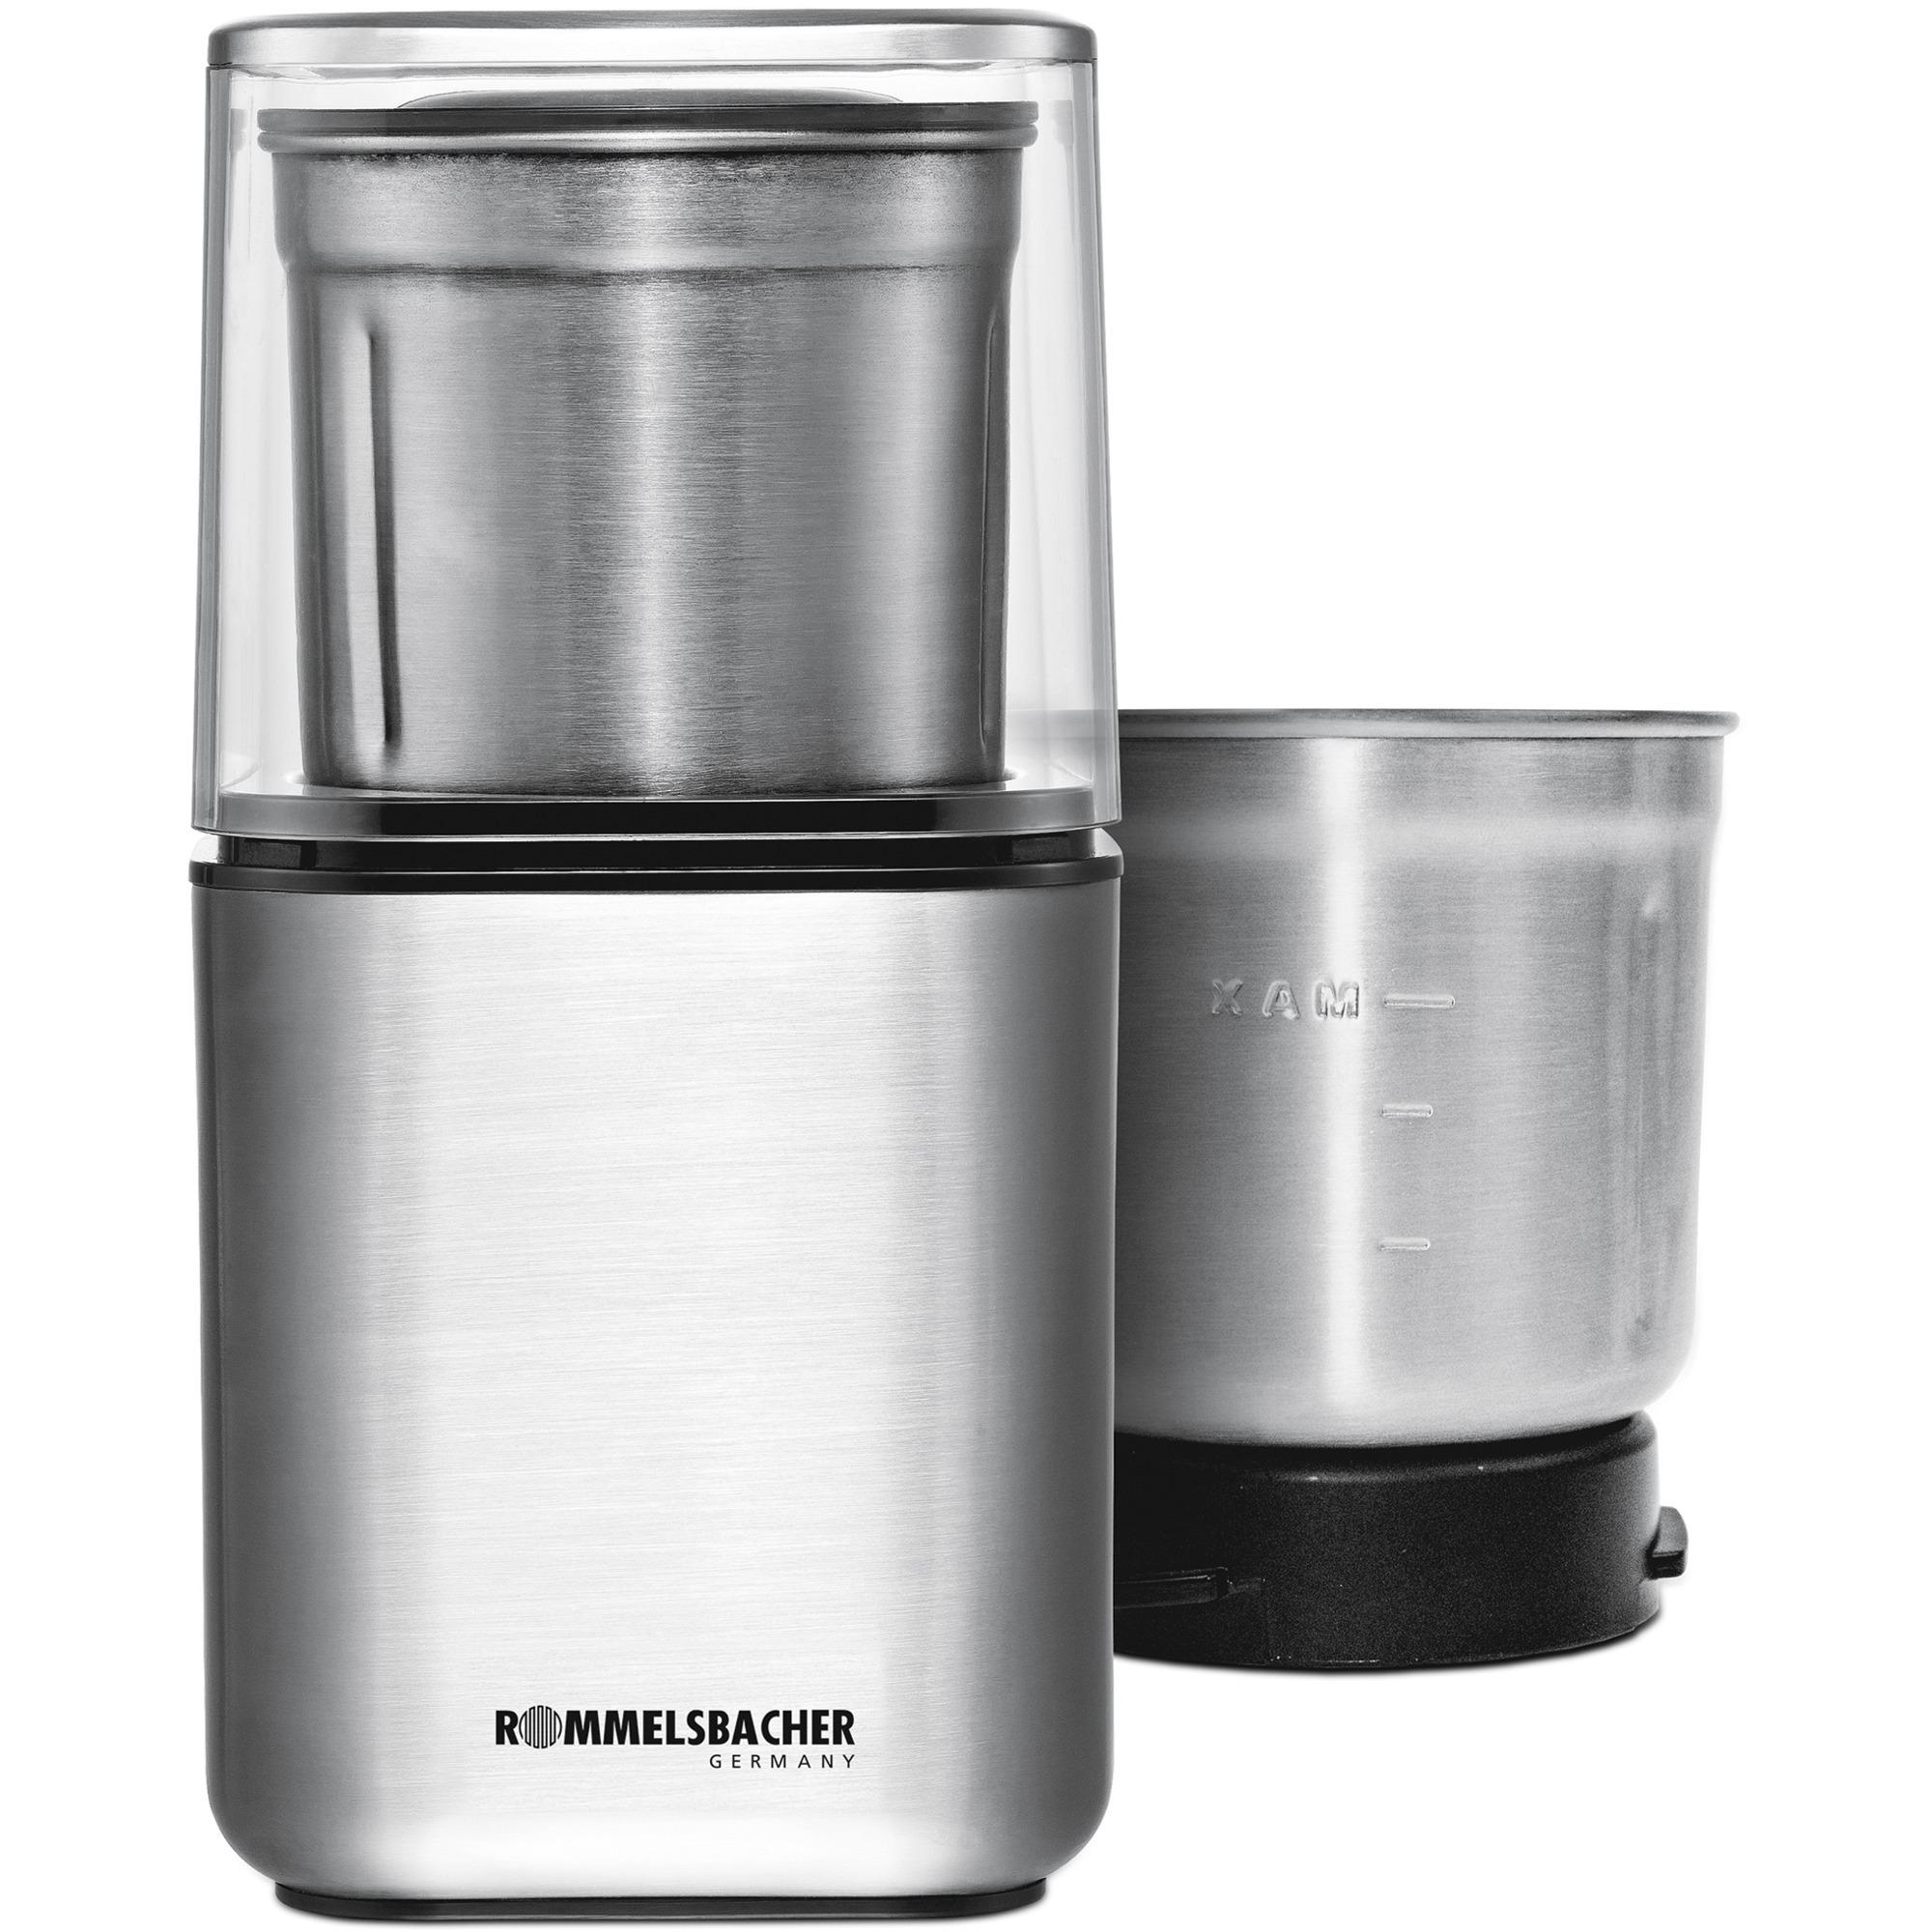 EGK 200 molinillo de café Triturador con cuchillas Acero inoxidable 200 W